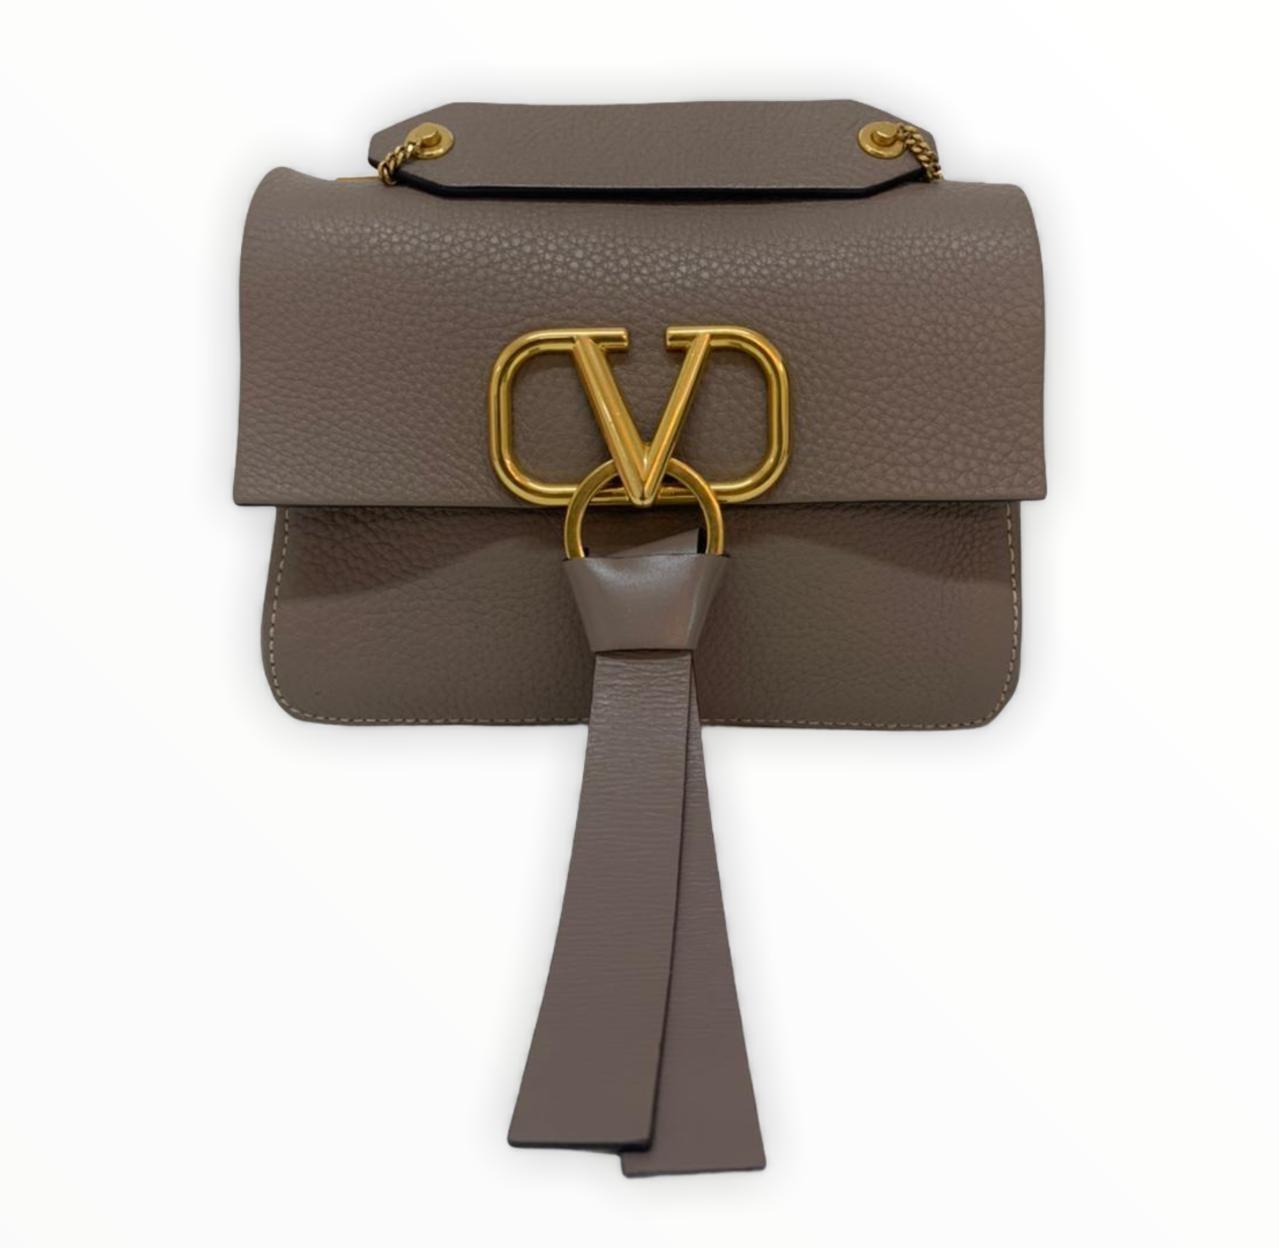 Bolsa Valentino VRING